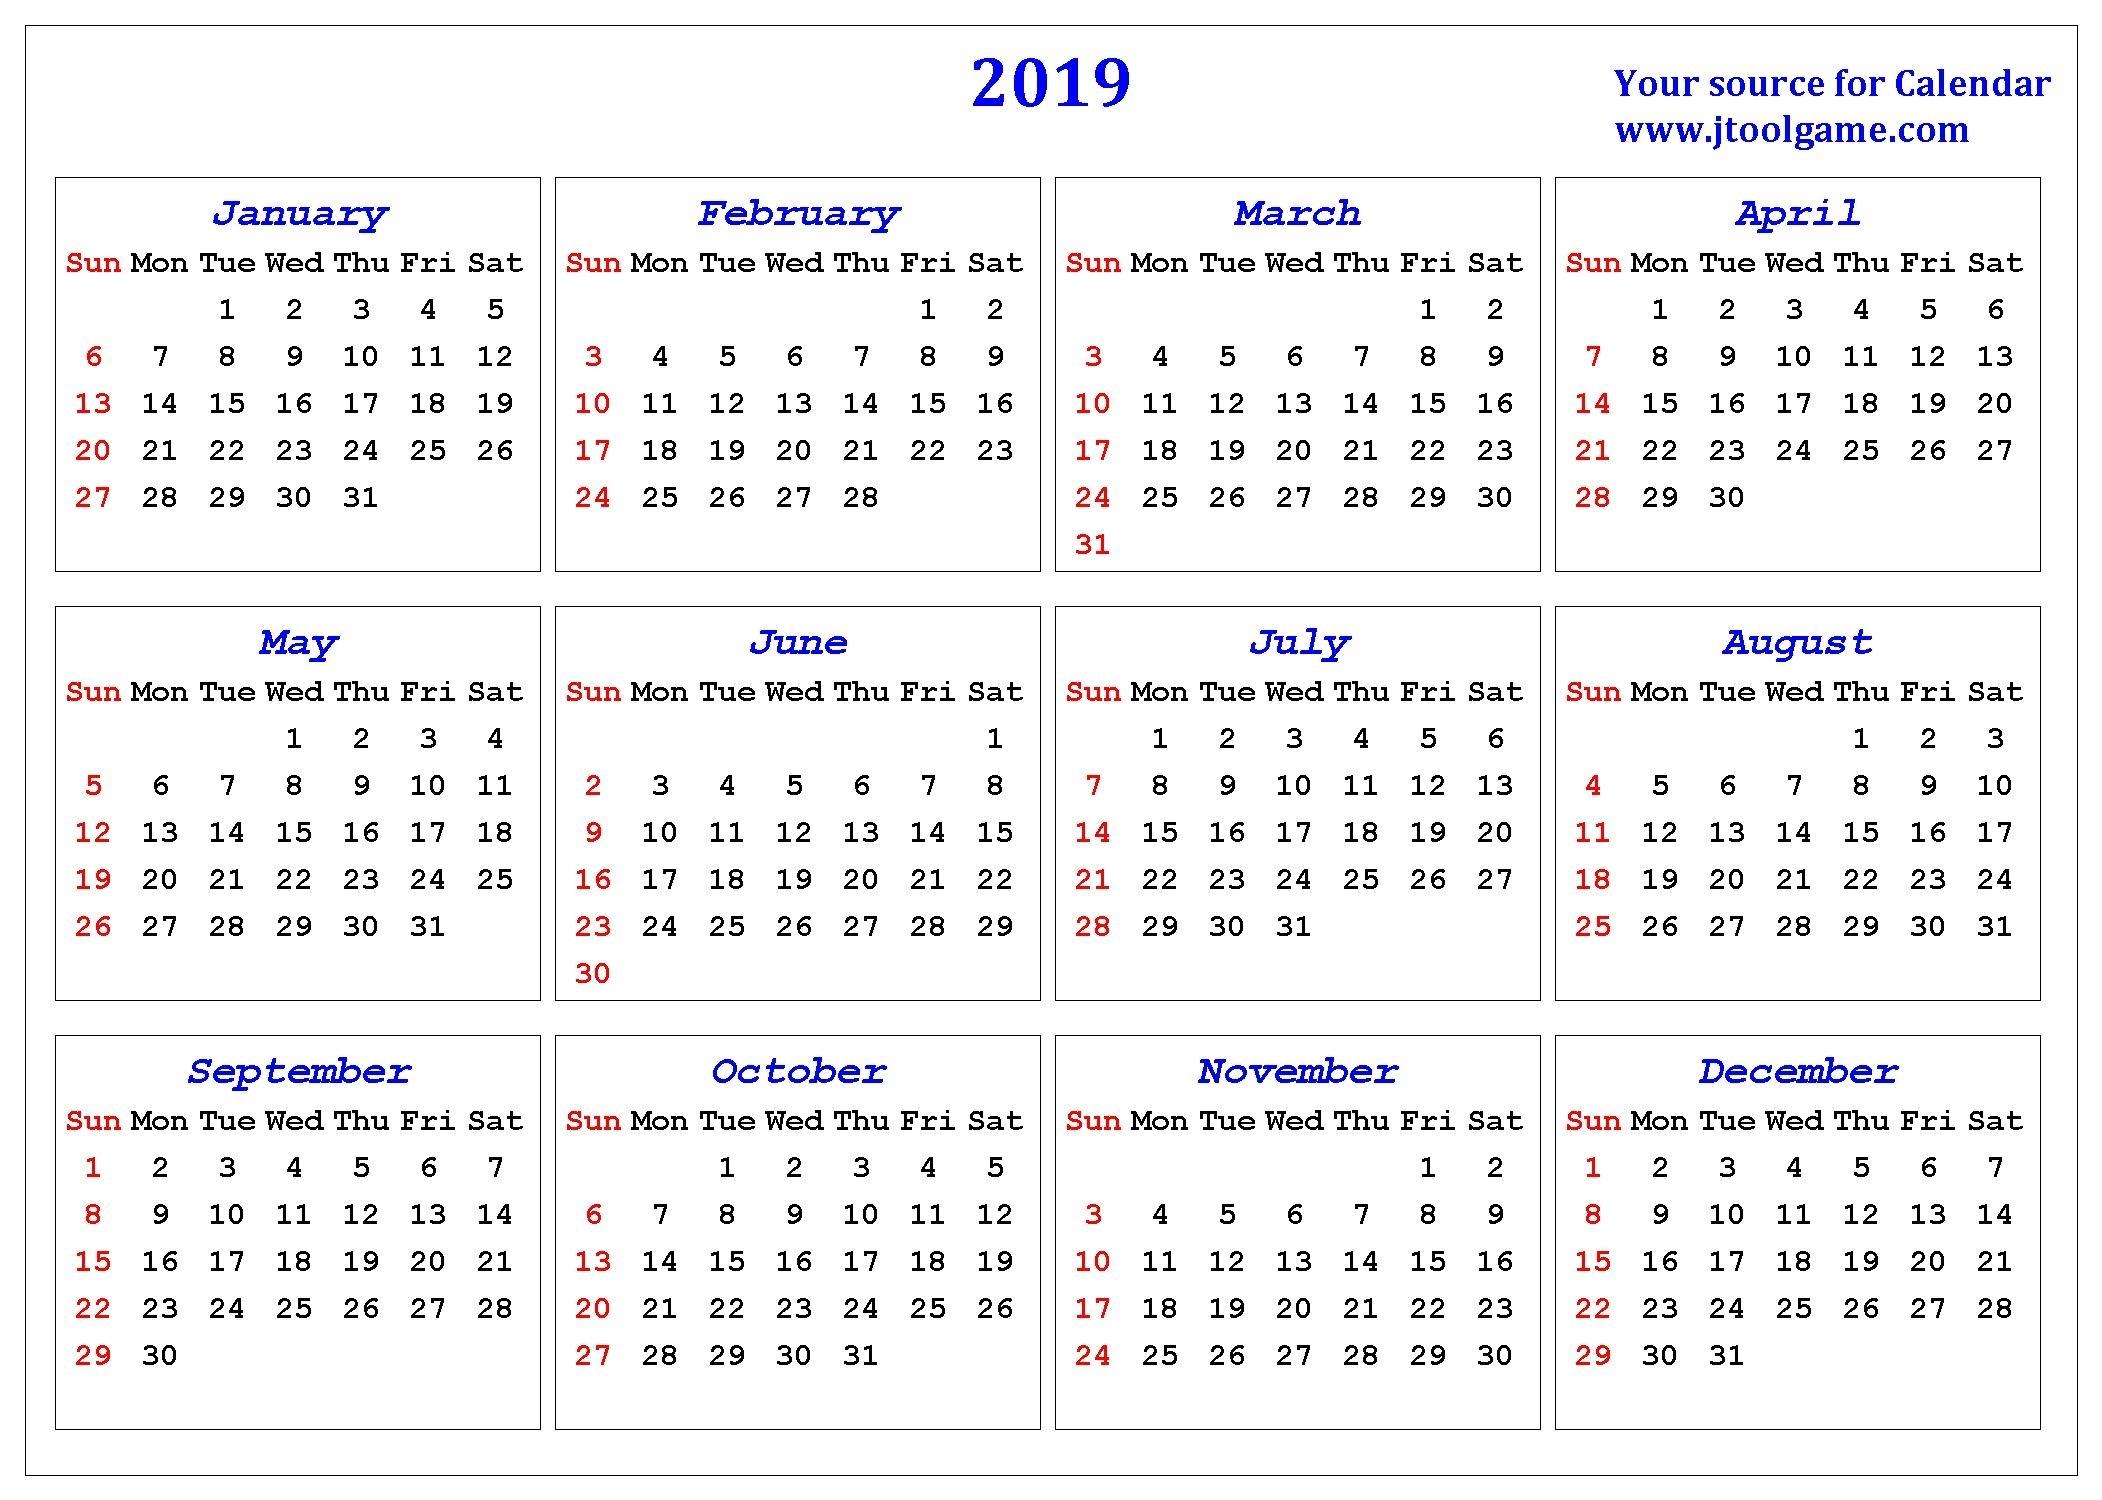 2019 Calendar - Printable Calendar. 2019 Calendar In